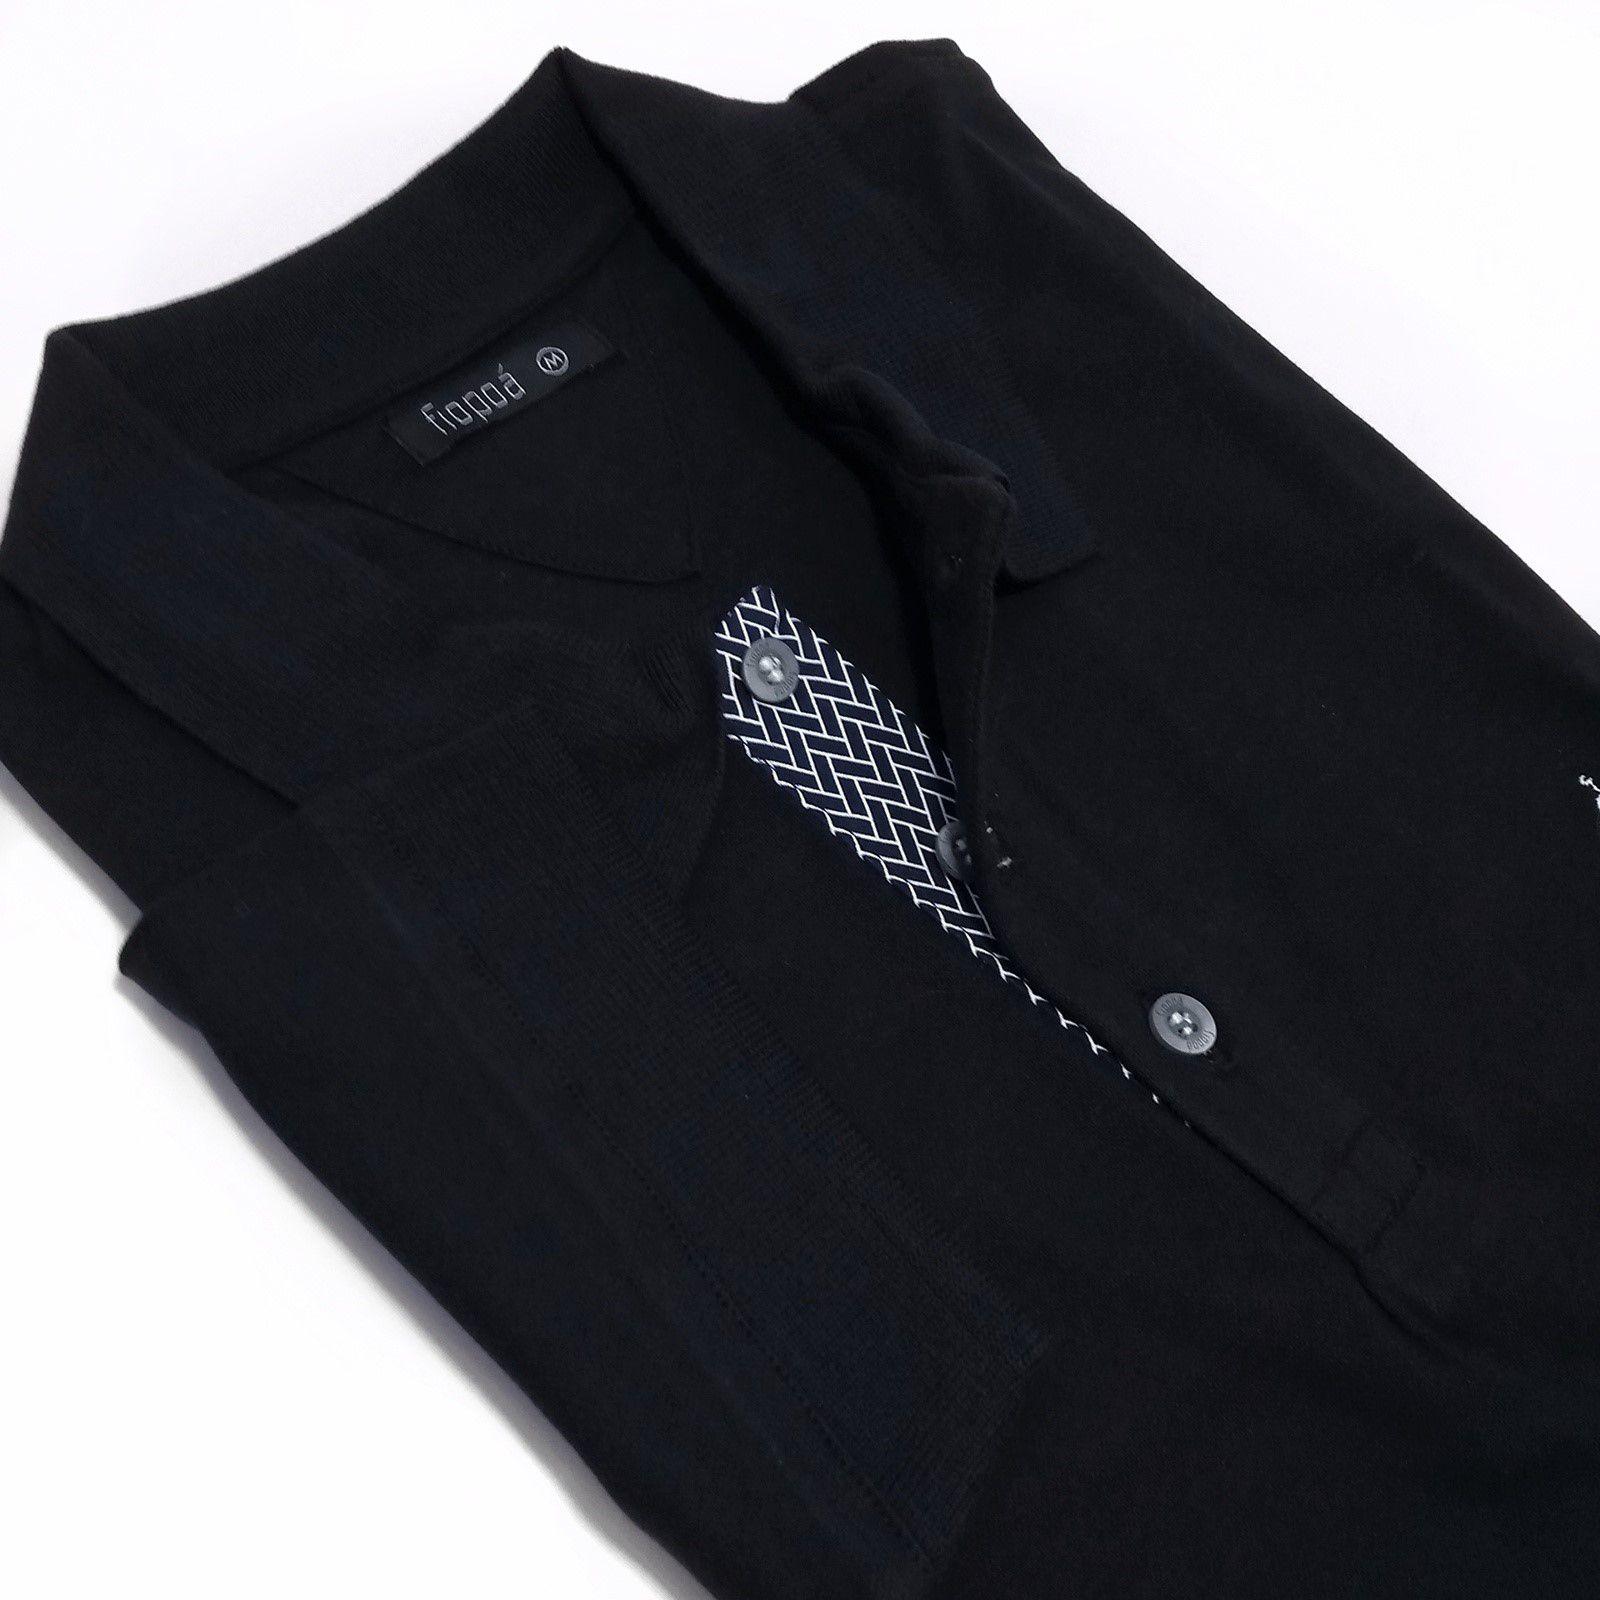 b9ac640f0a Camisa Polo Masculina Preta Detalhe Geométrico